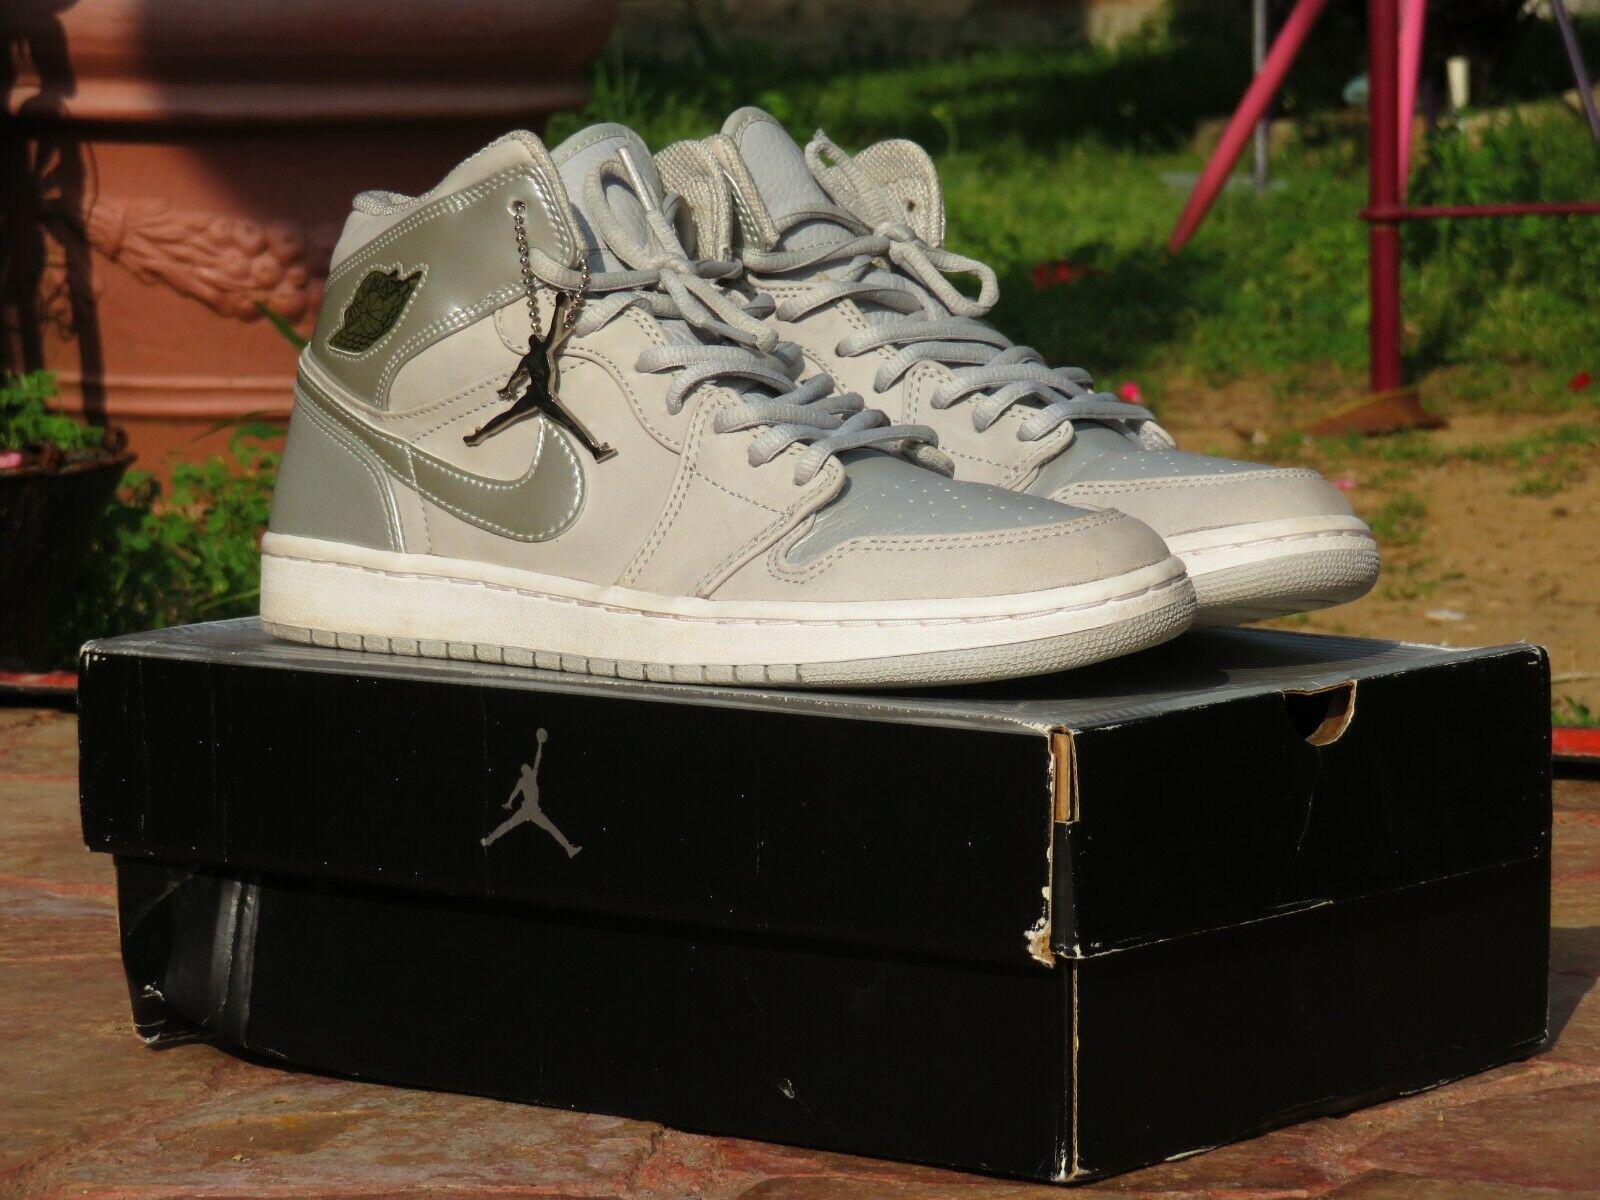 Air Jordan Retro 1 Neutral Grey Size 10 Men Rare 2001 Pre Owned 136065-001